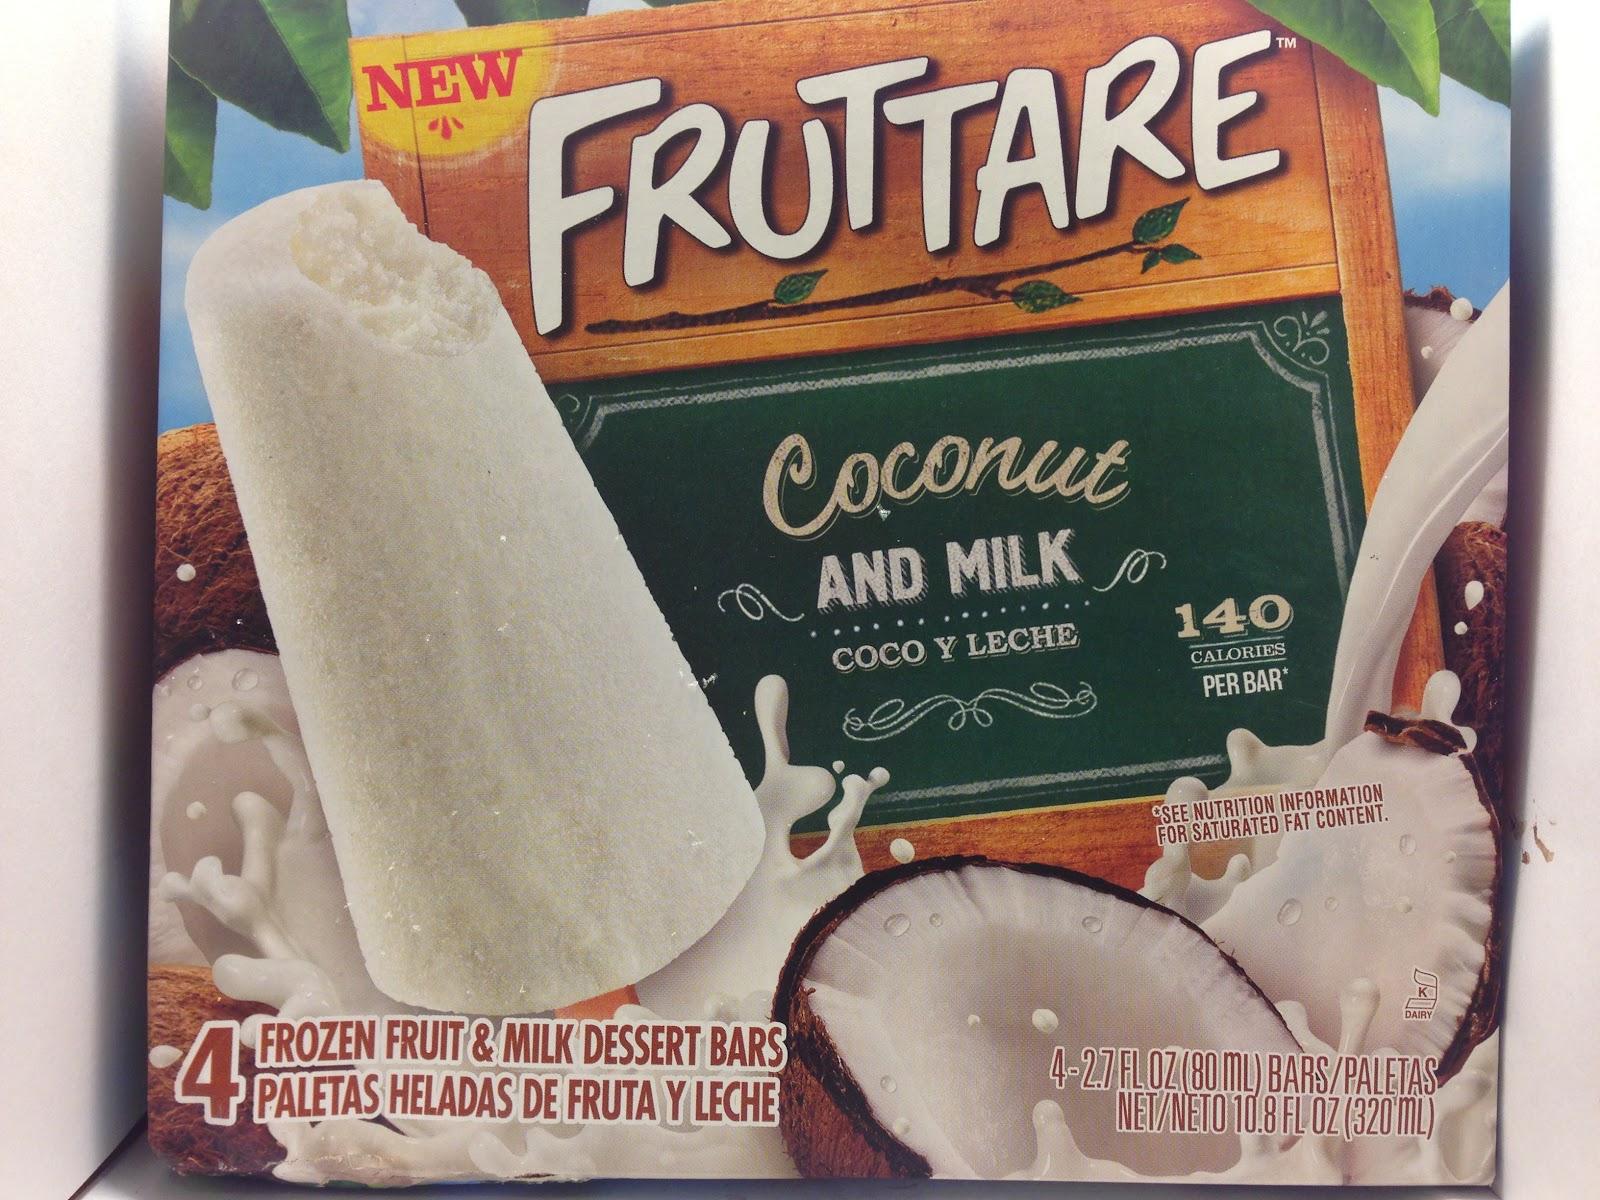 ... : Review: Fruttare Coconut and Milk Frozen Fruit & Milk Dessert Bars